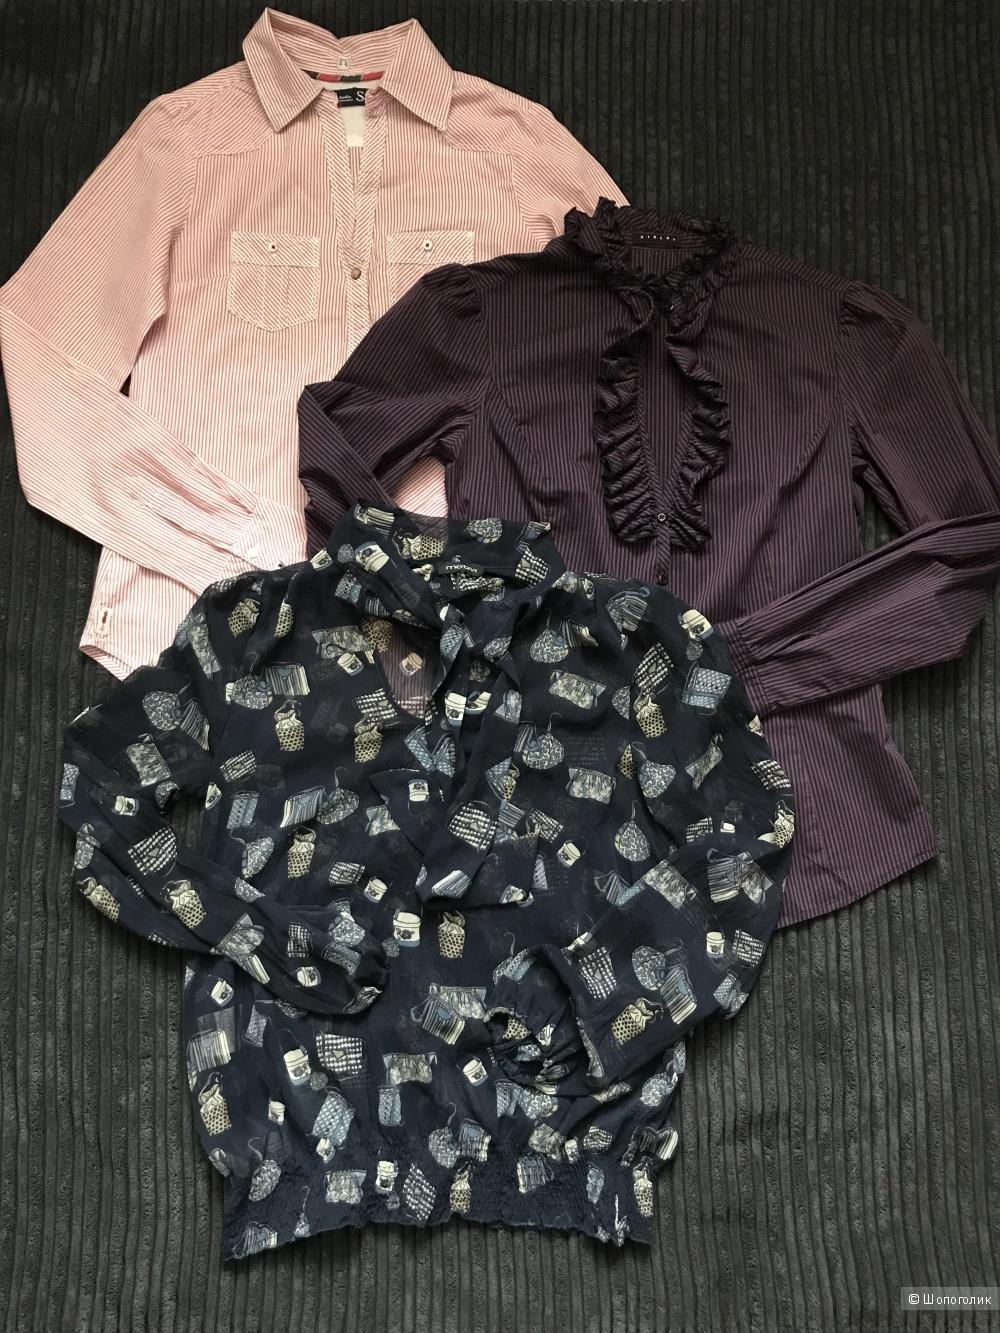 Сет блузка Sisley (S) + рубашка Bershka (S) + блузка Motivi (uk 6-eur34)